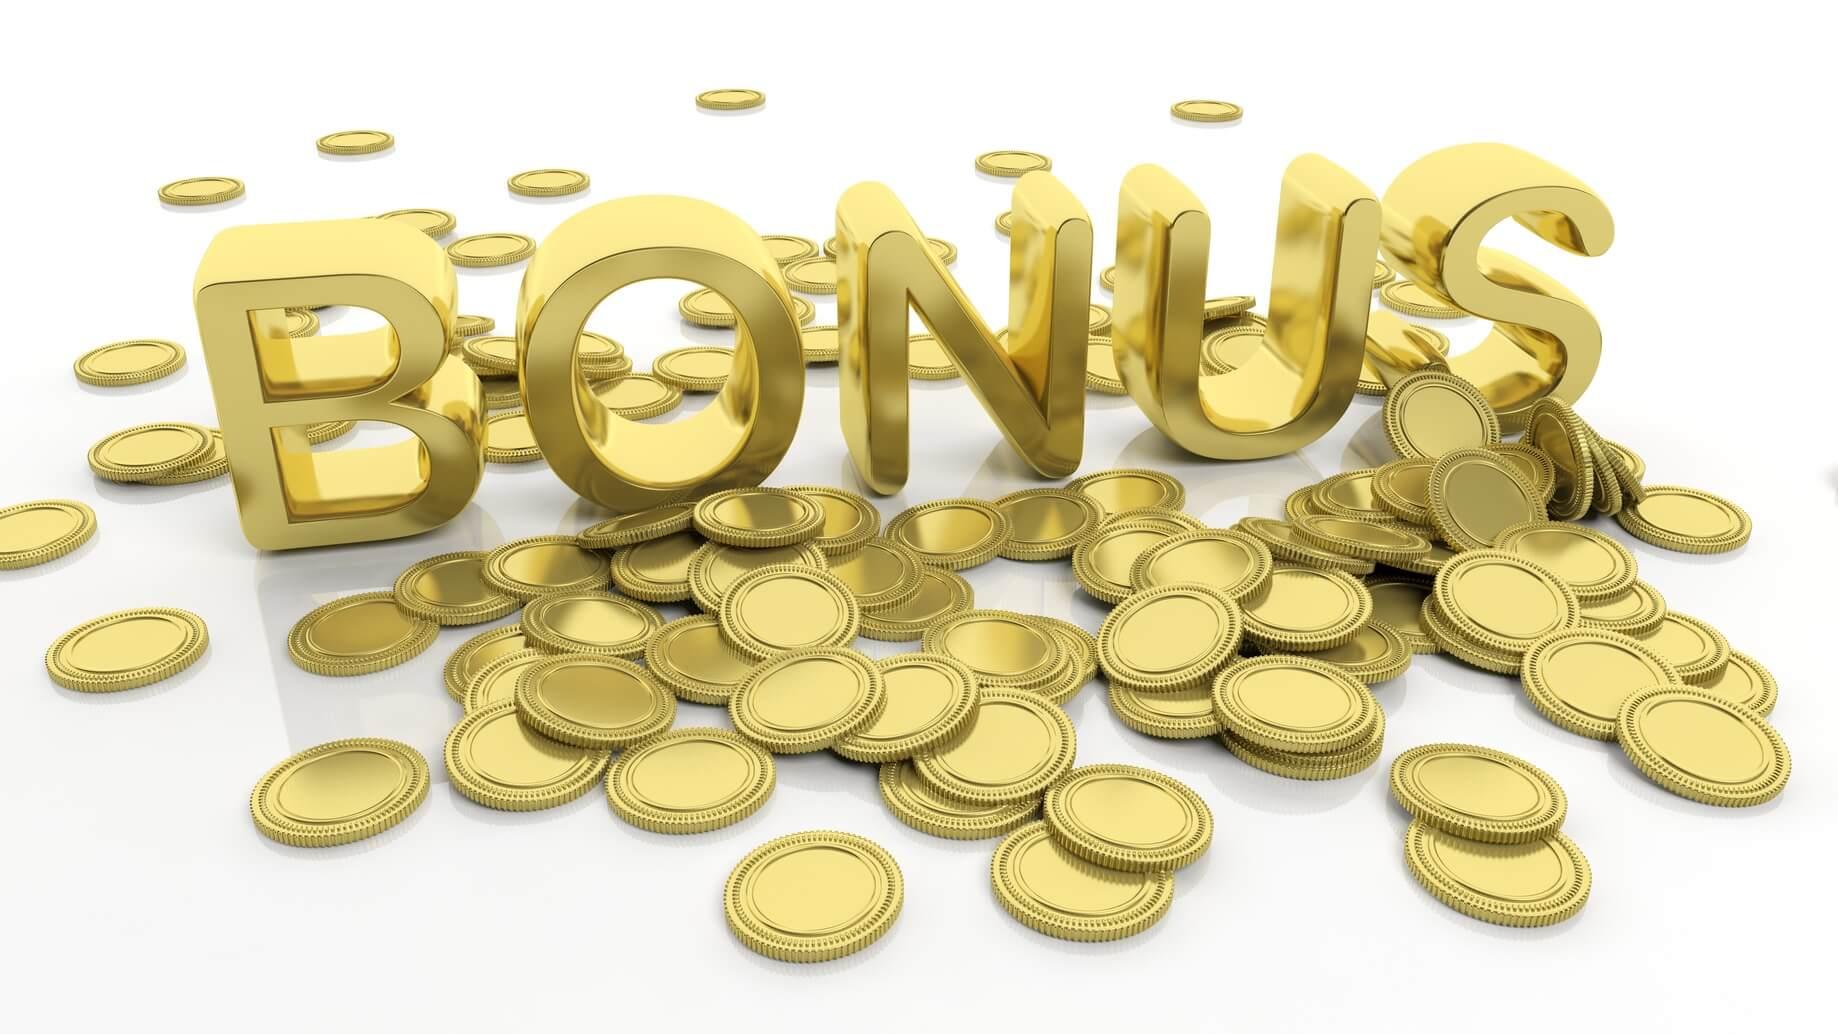 How to Take Advantage of Casino Bonuses to Win Big